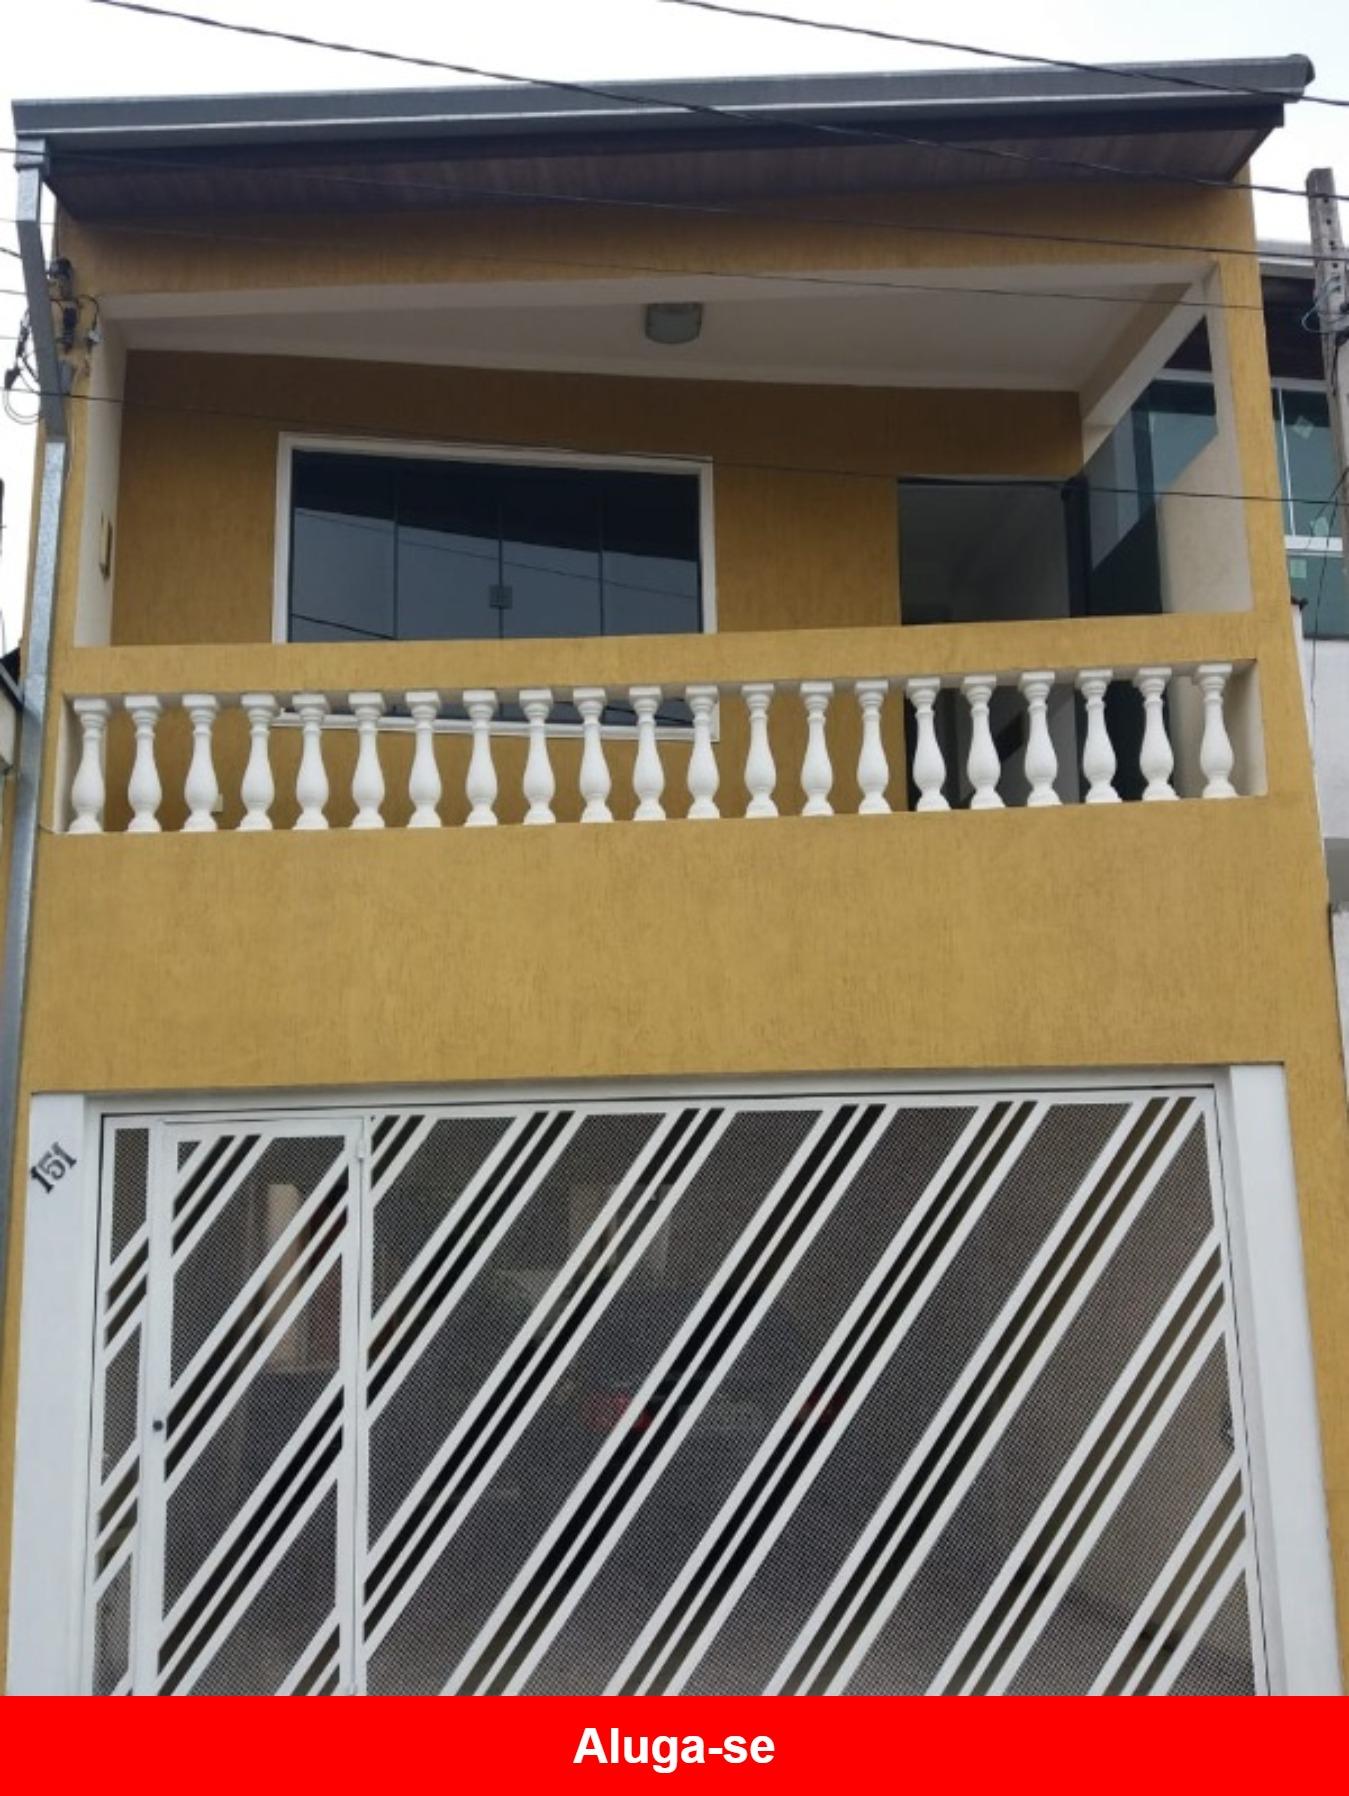 Aluga-se casa no JARDIM CASA BRANCA, Sorocaba - SP